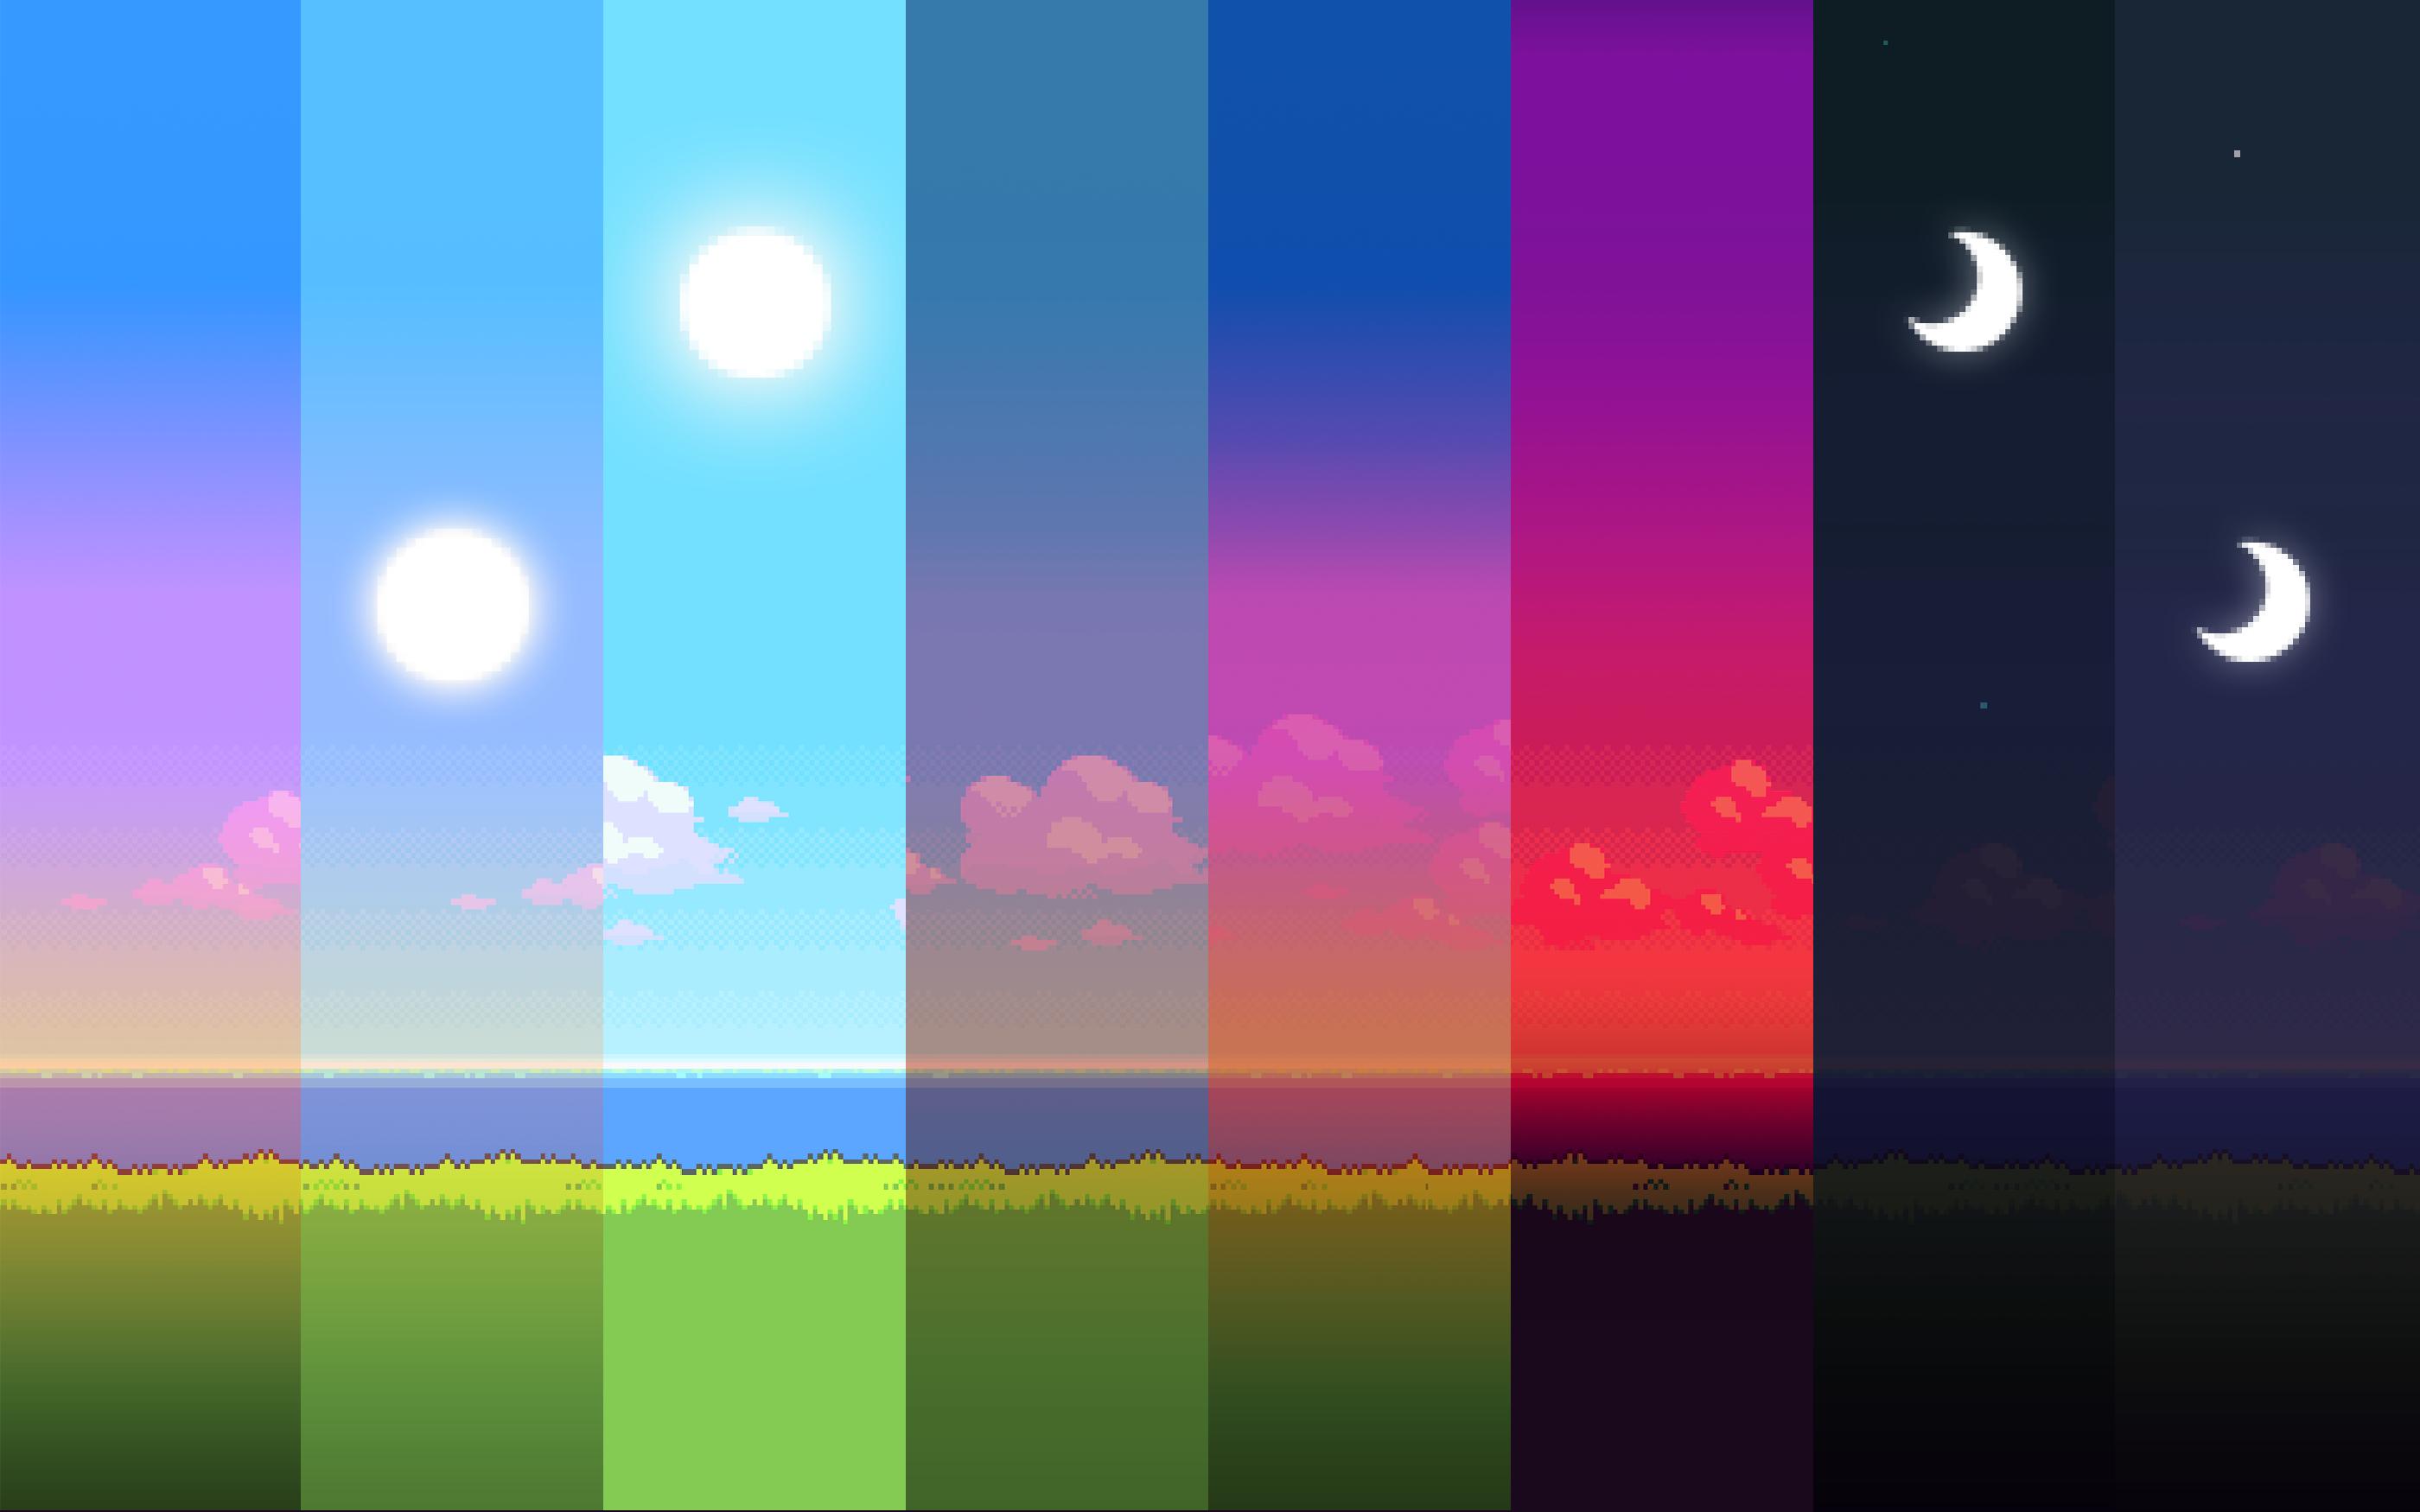 General 2800x1750 spectrum Sun Moon collage digital art colorful pixel art